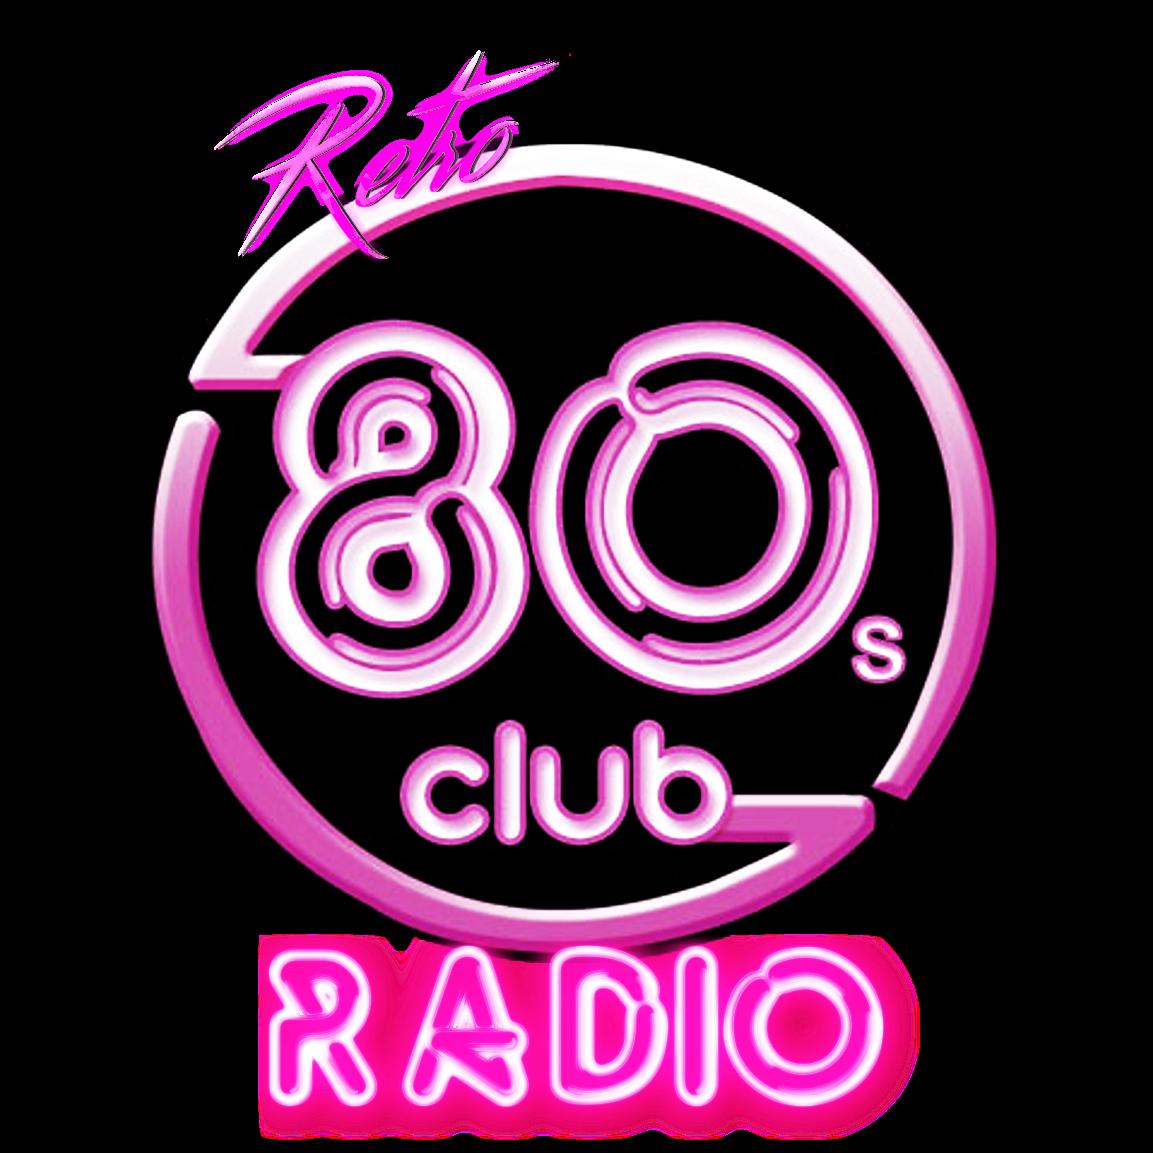 Retro 80's club Radio